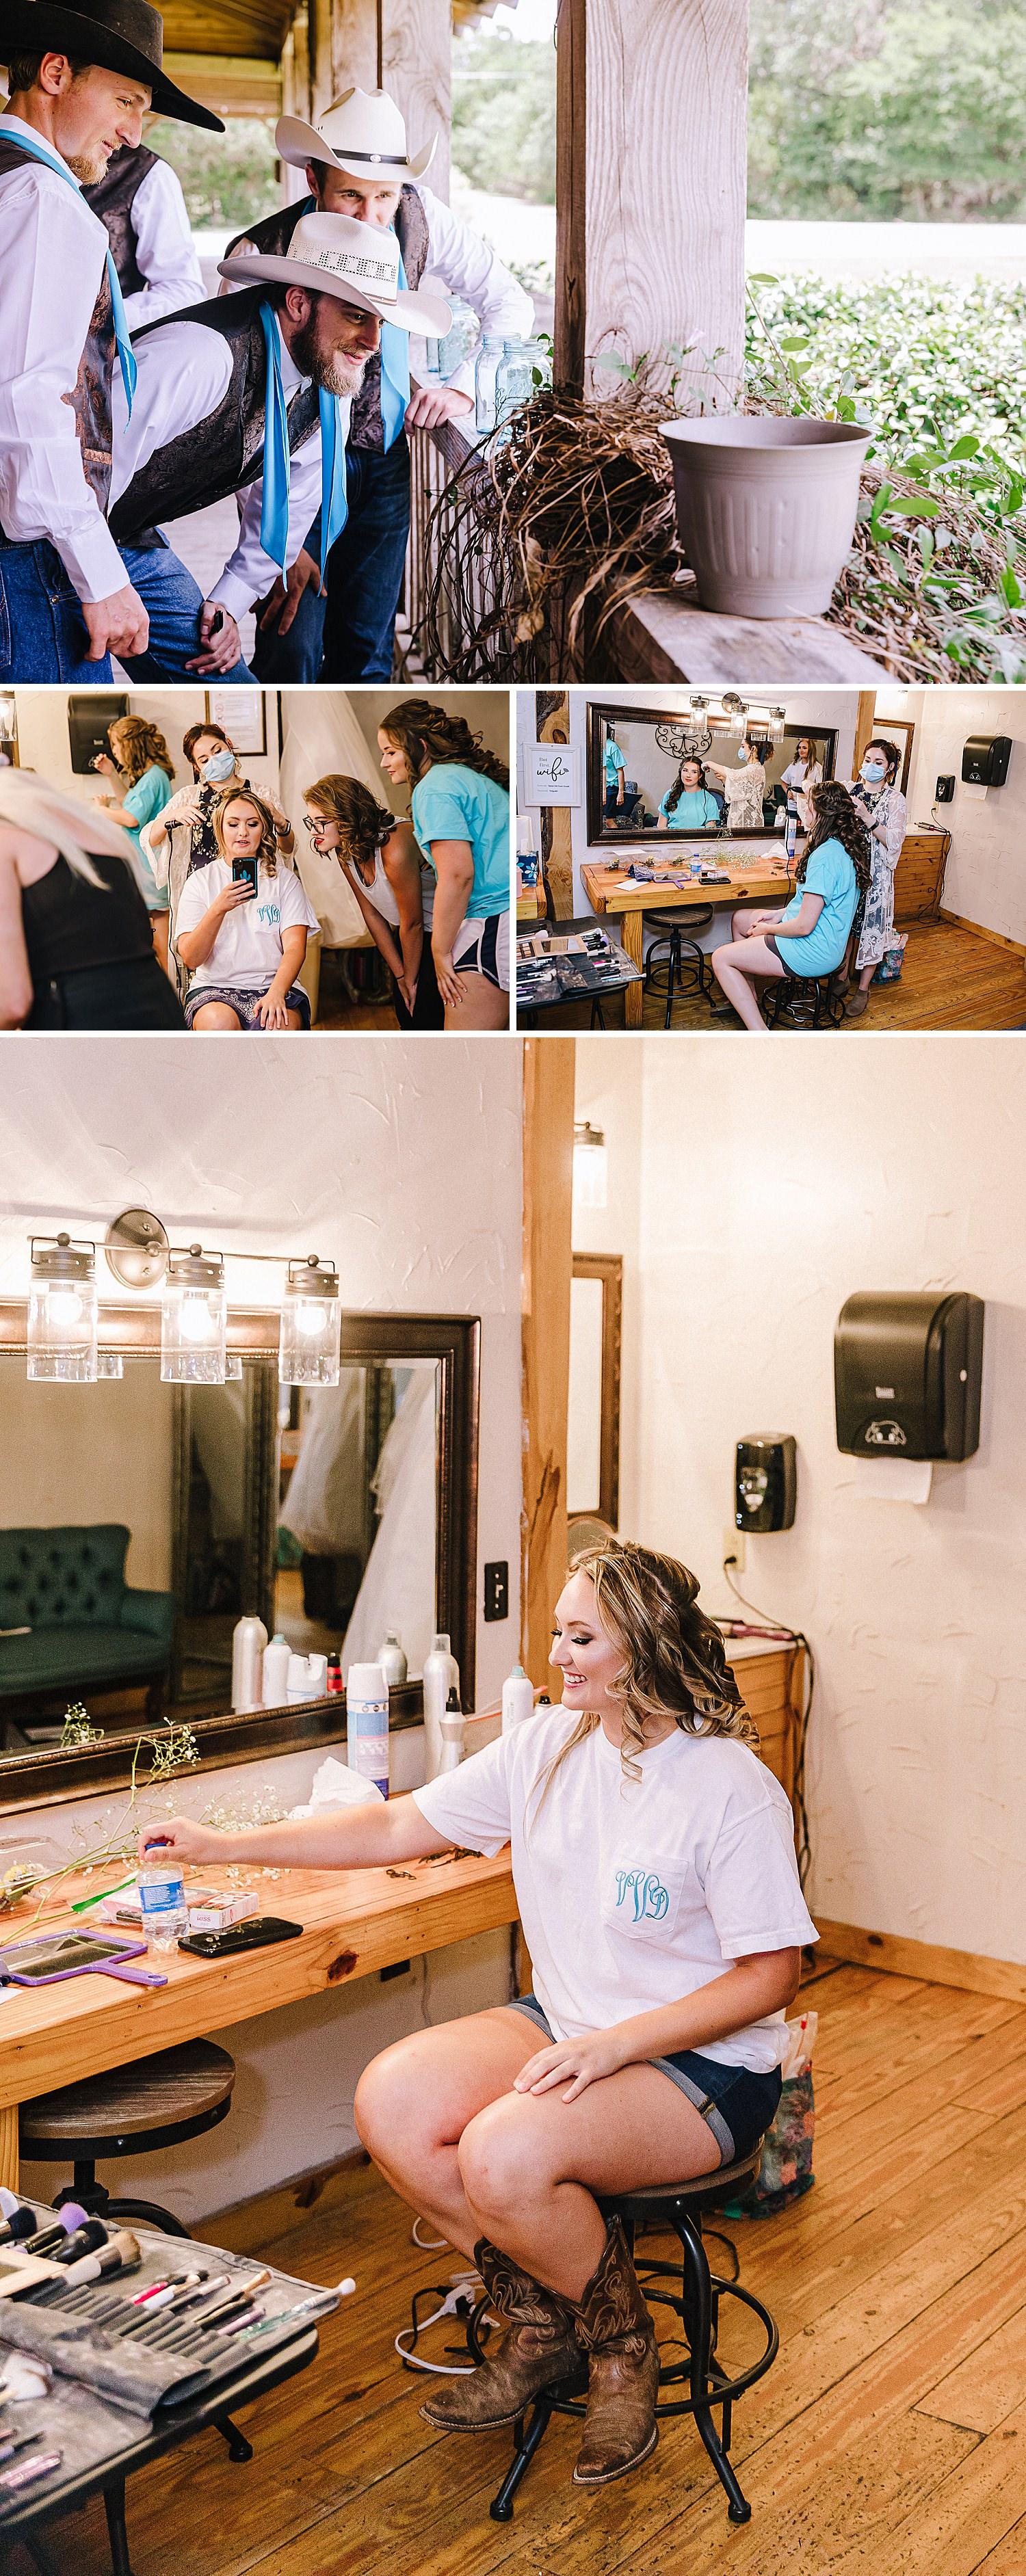 Carly-Barton-Photography-Old-Town-Texas-Rustic-Wedding-Photos-Sunflowers-Boots-Kyle-Texas_0029.jpg